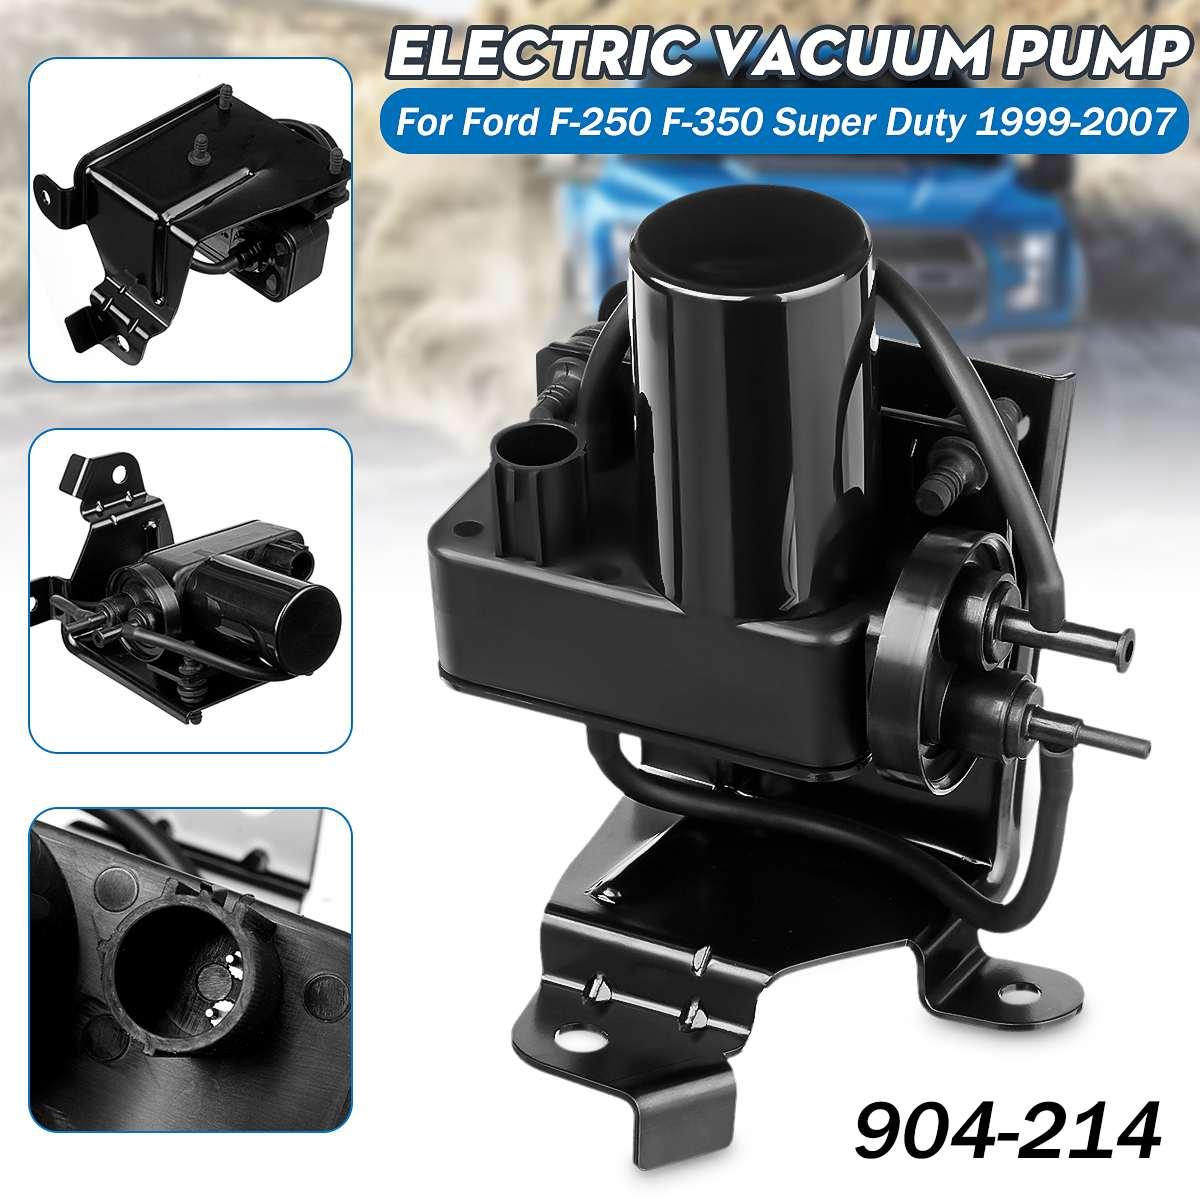 Car Diesel Electric Motor Vacuum Pump For Ford F-250 F-350 F-450 F-550 Super Duty For Dodge Ram 2500 3500